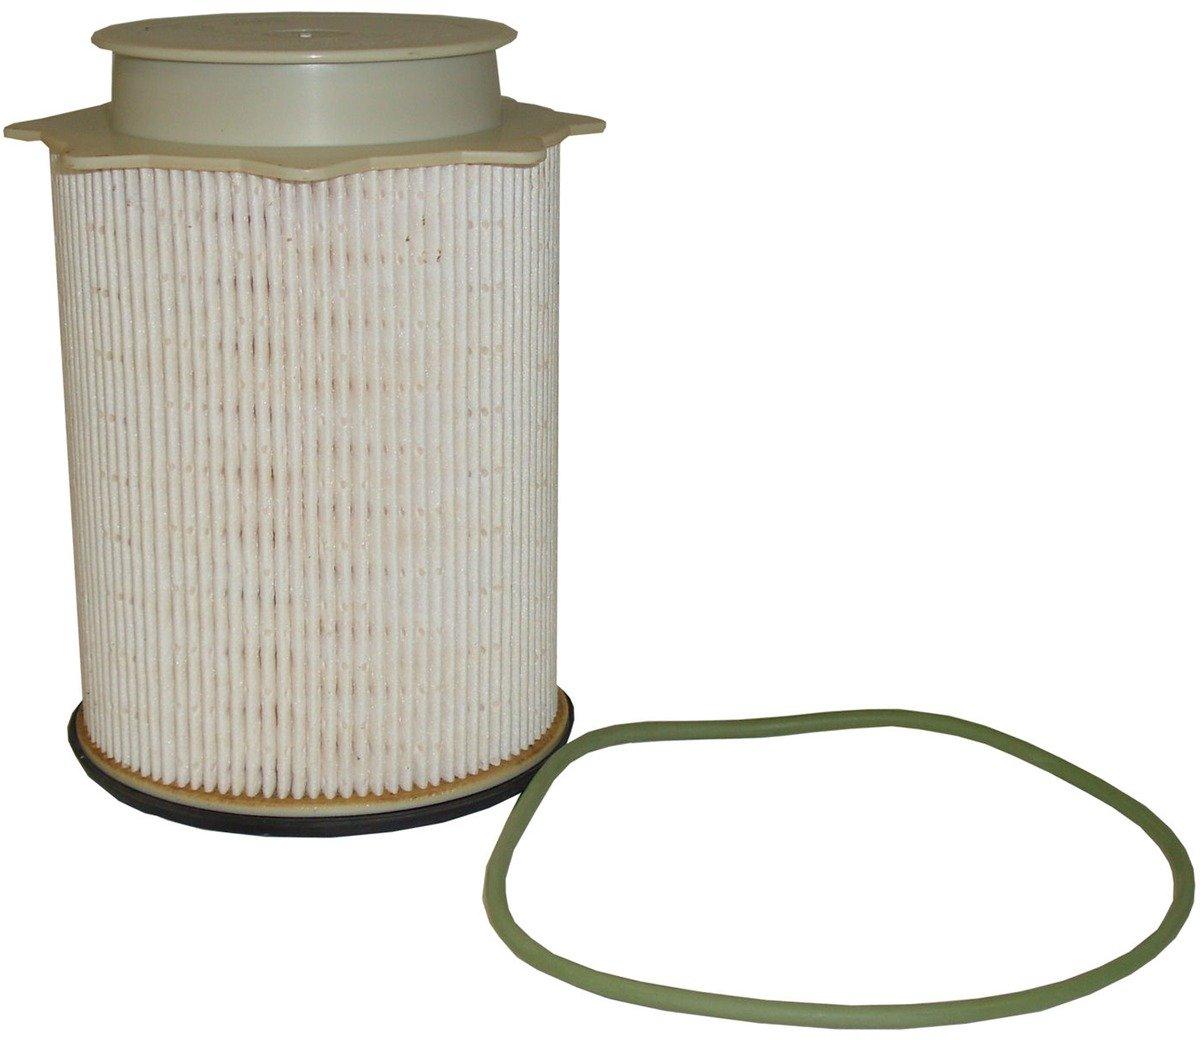 Luber-finer L6806F Heavy Duty Fuel Filter